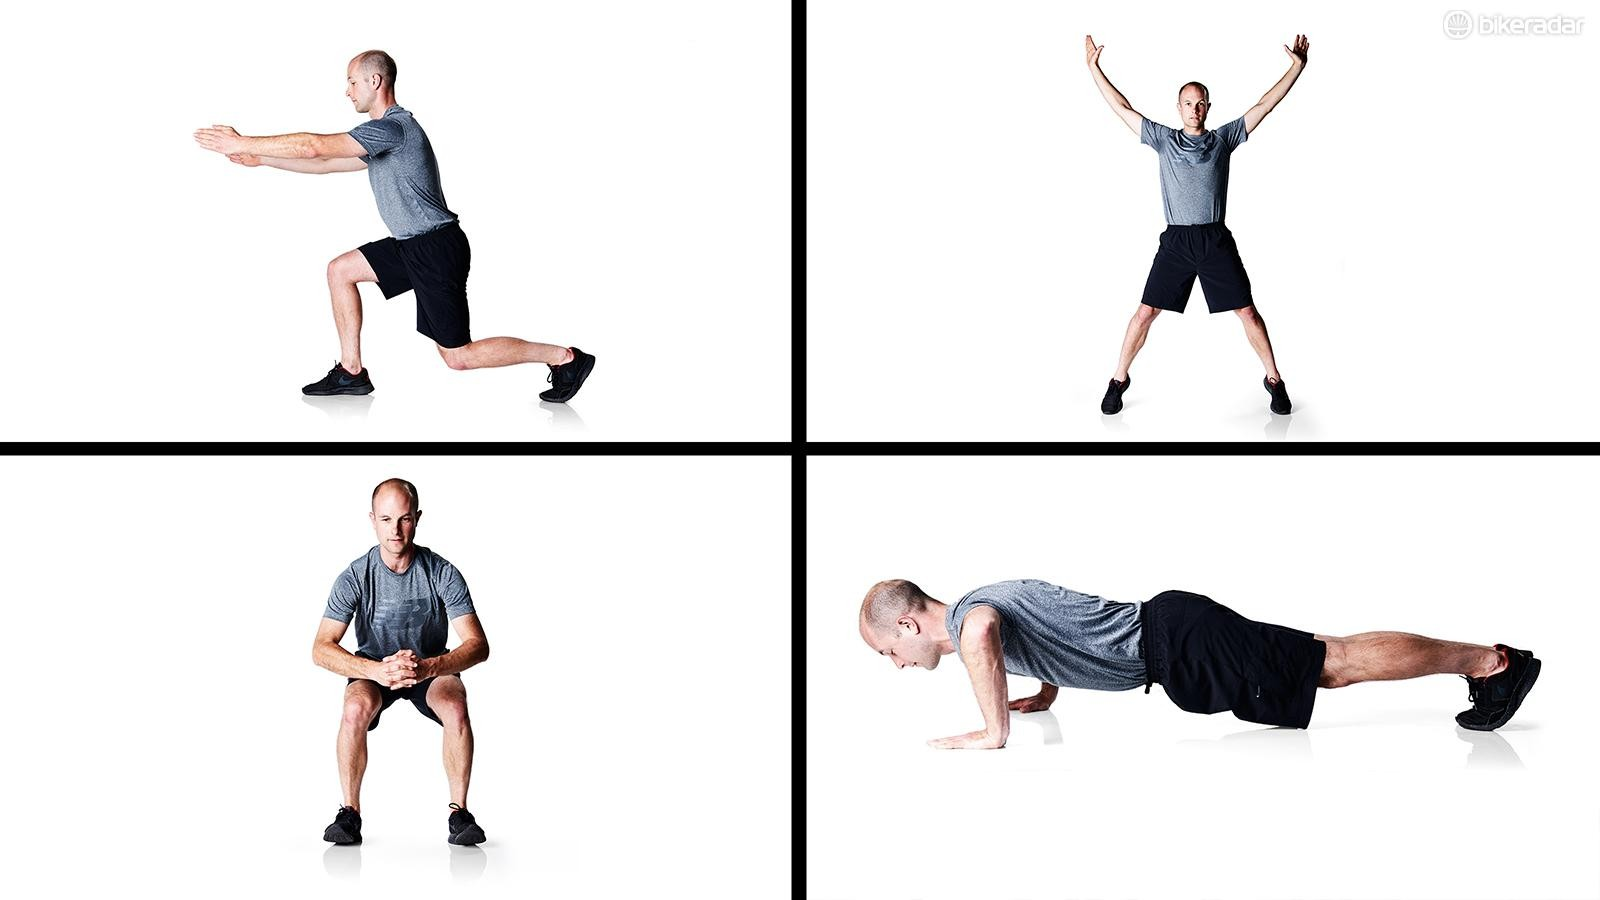 Quick exercises for improving strength for mountain biking